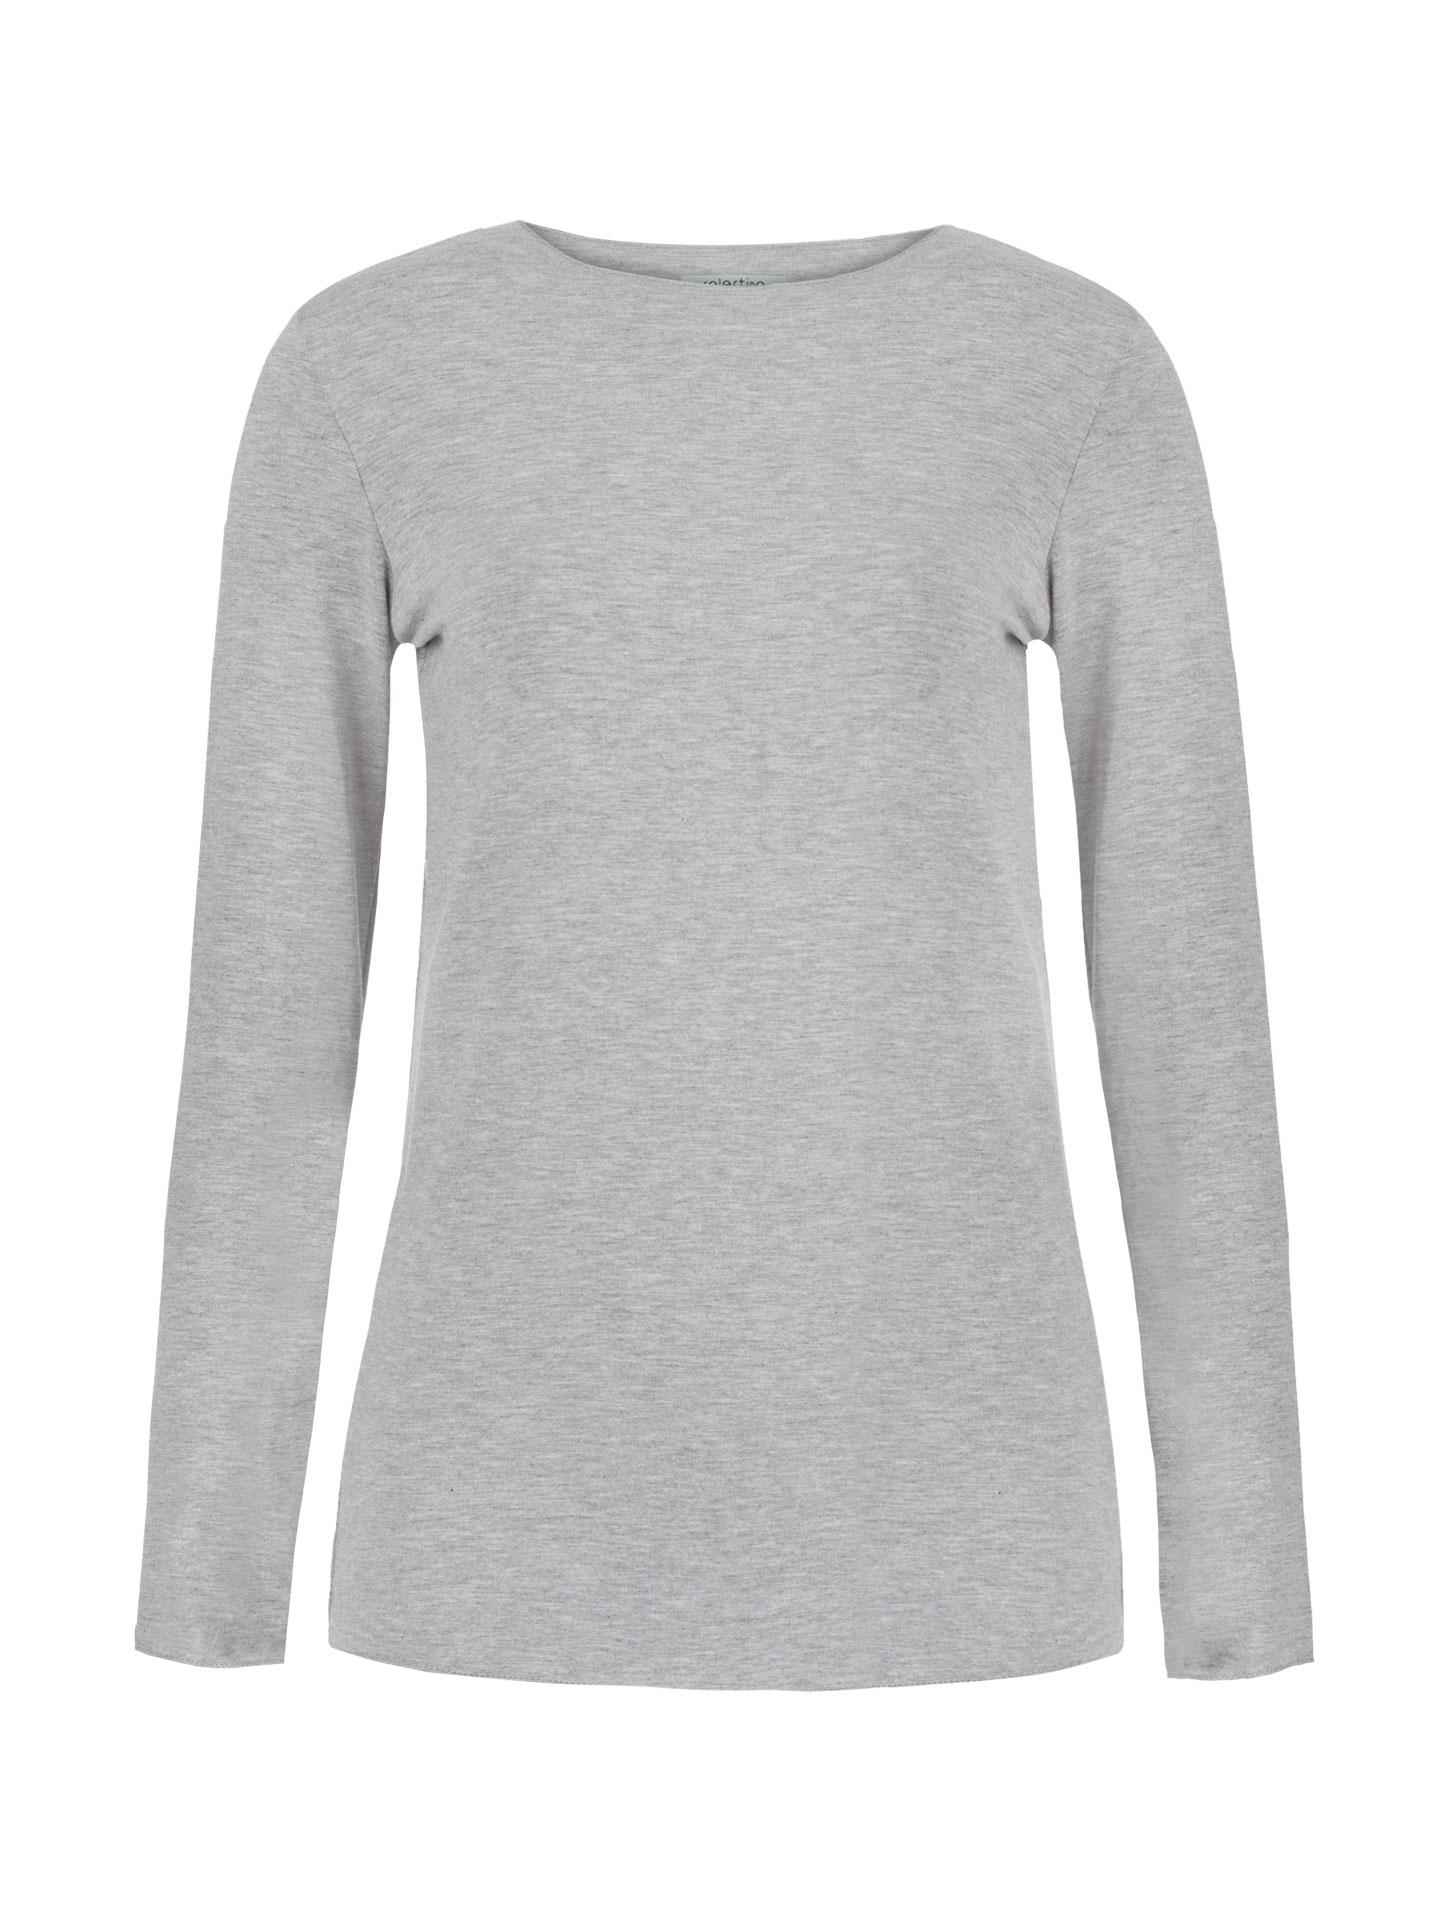 acd48fa43fe6 Μακρυμάνικη μπλούζα σε γκρι ανοιχτο